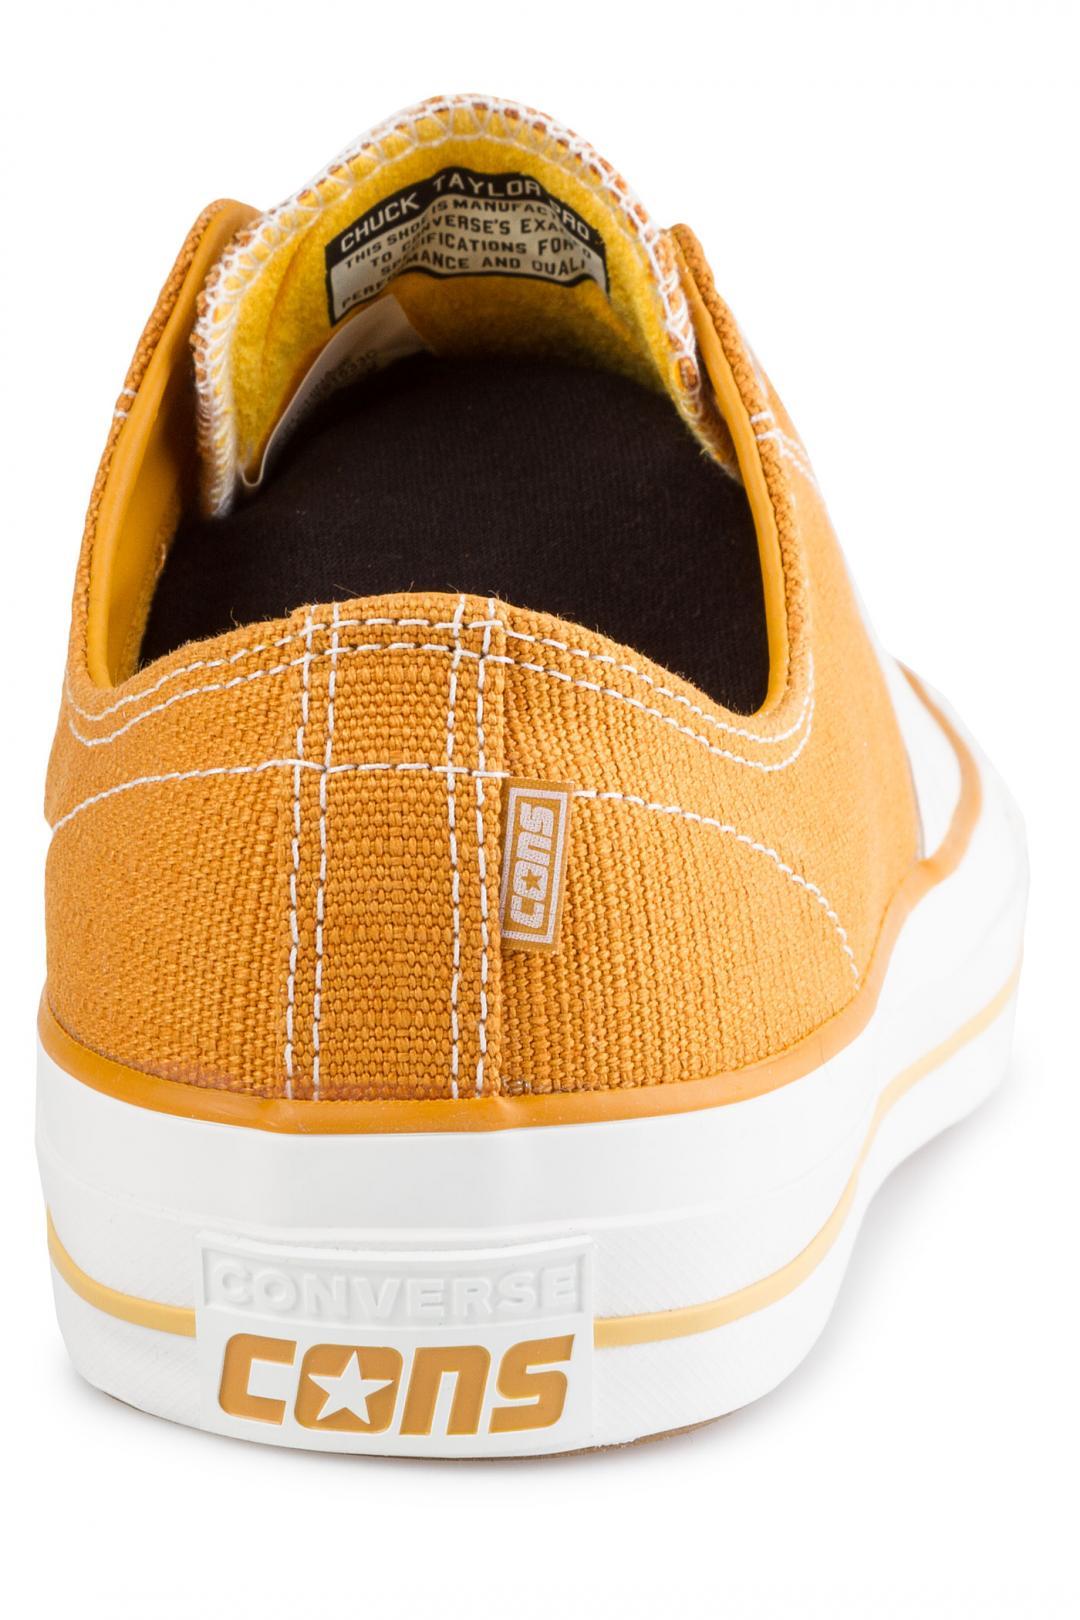 Uomo Converse Chuck Taylor All Star Pro turmeric gold vintage white | Sneaker